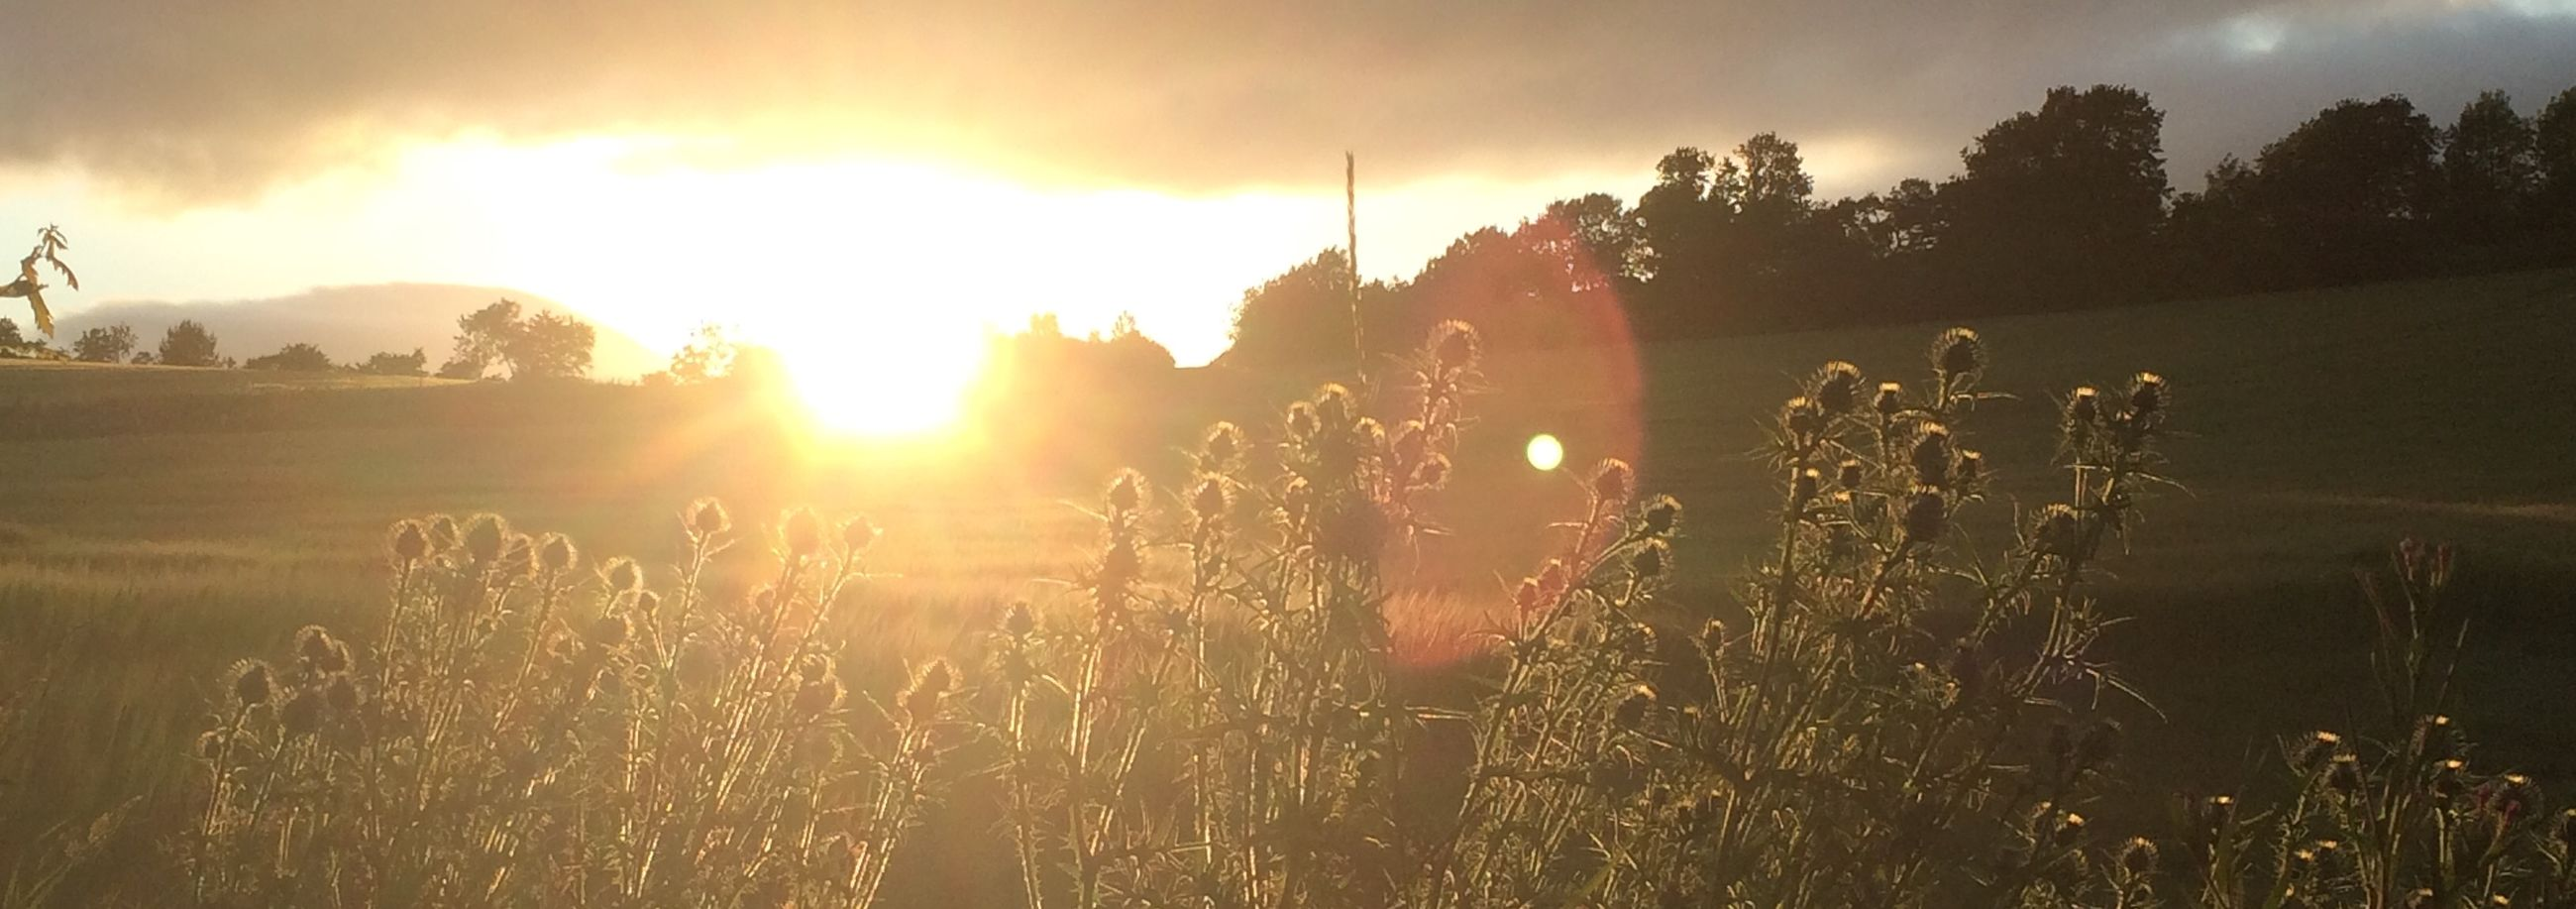 sun, sunset, sky, sunbeam, sunlight, tranquility, tranquil scene, nature, landscape, beauty in nature, scenics, field, lens flare, cloud - sky, plant, non-urban scene, silhouette, idyllic, growth, outdoors